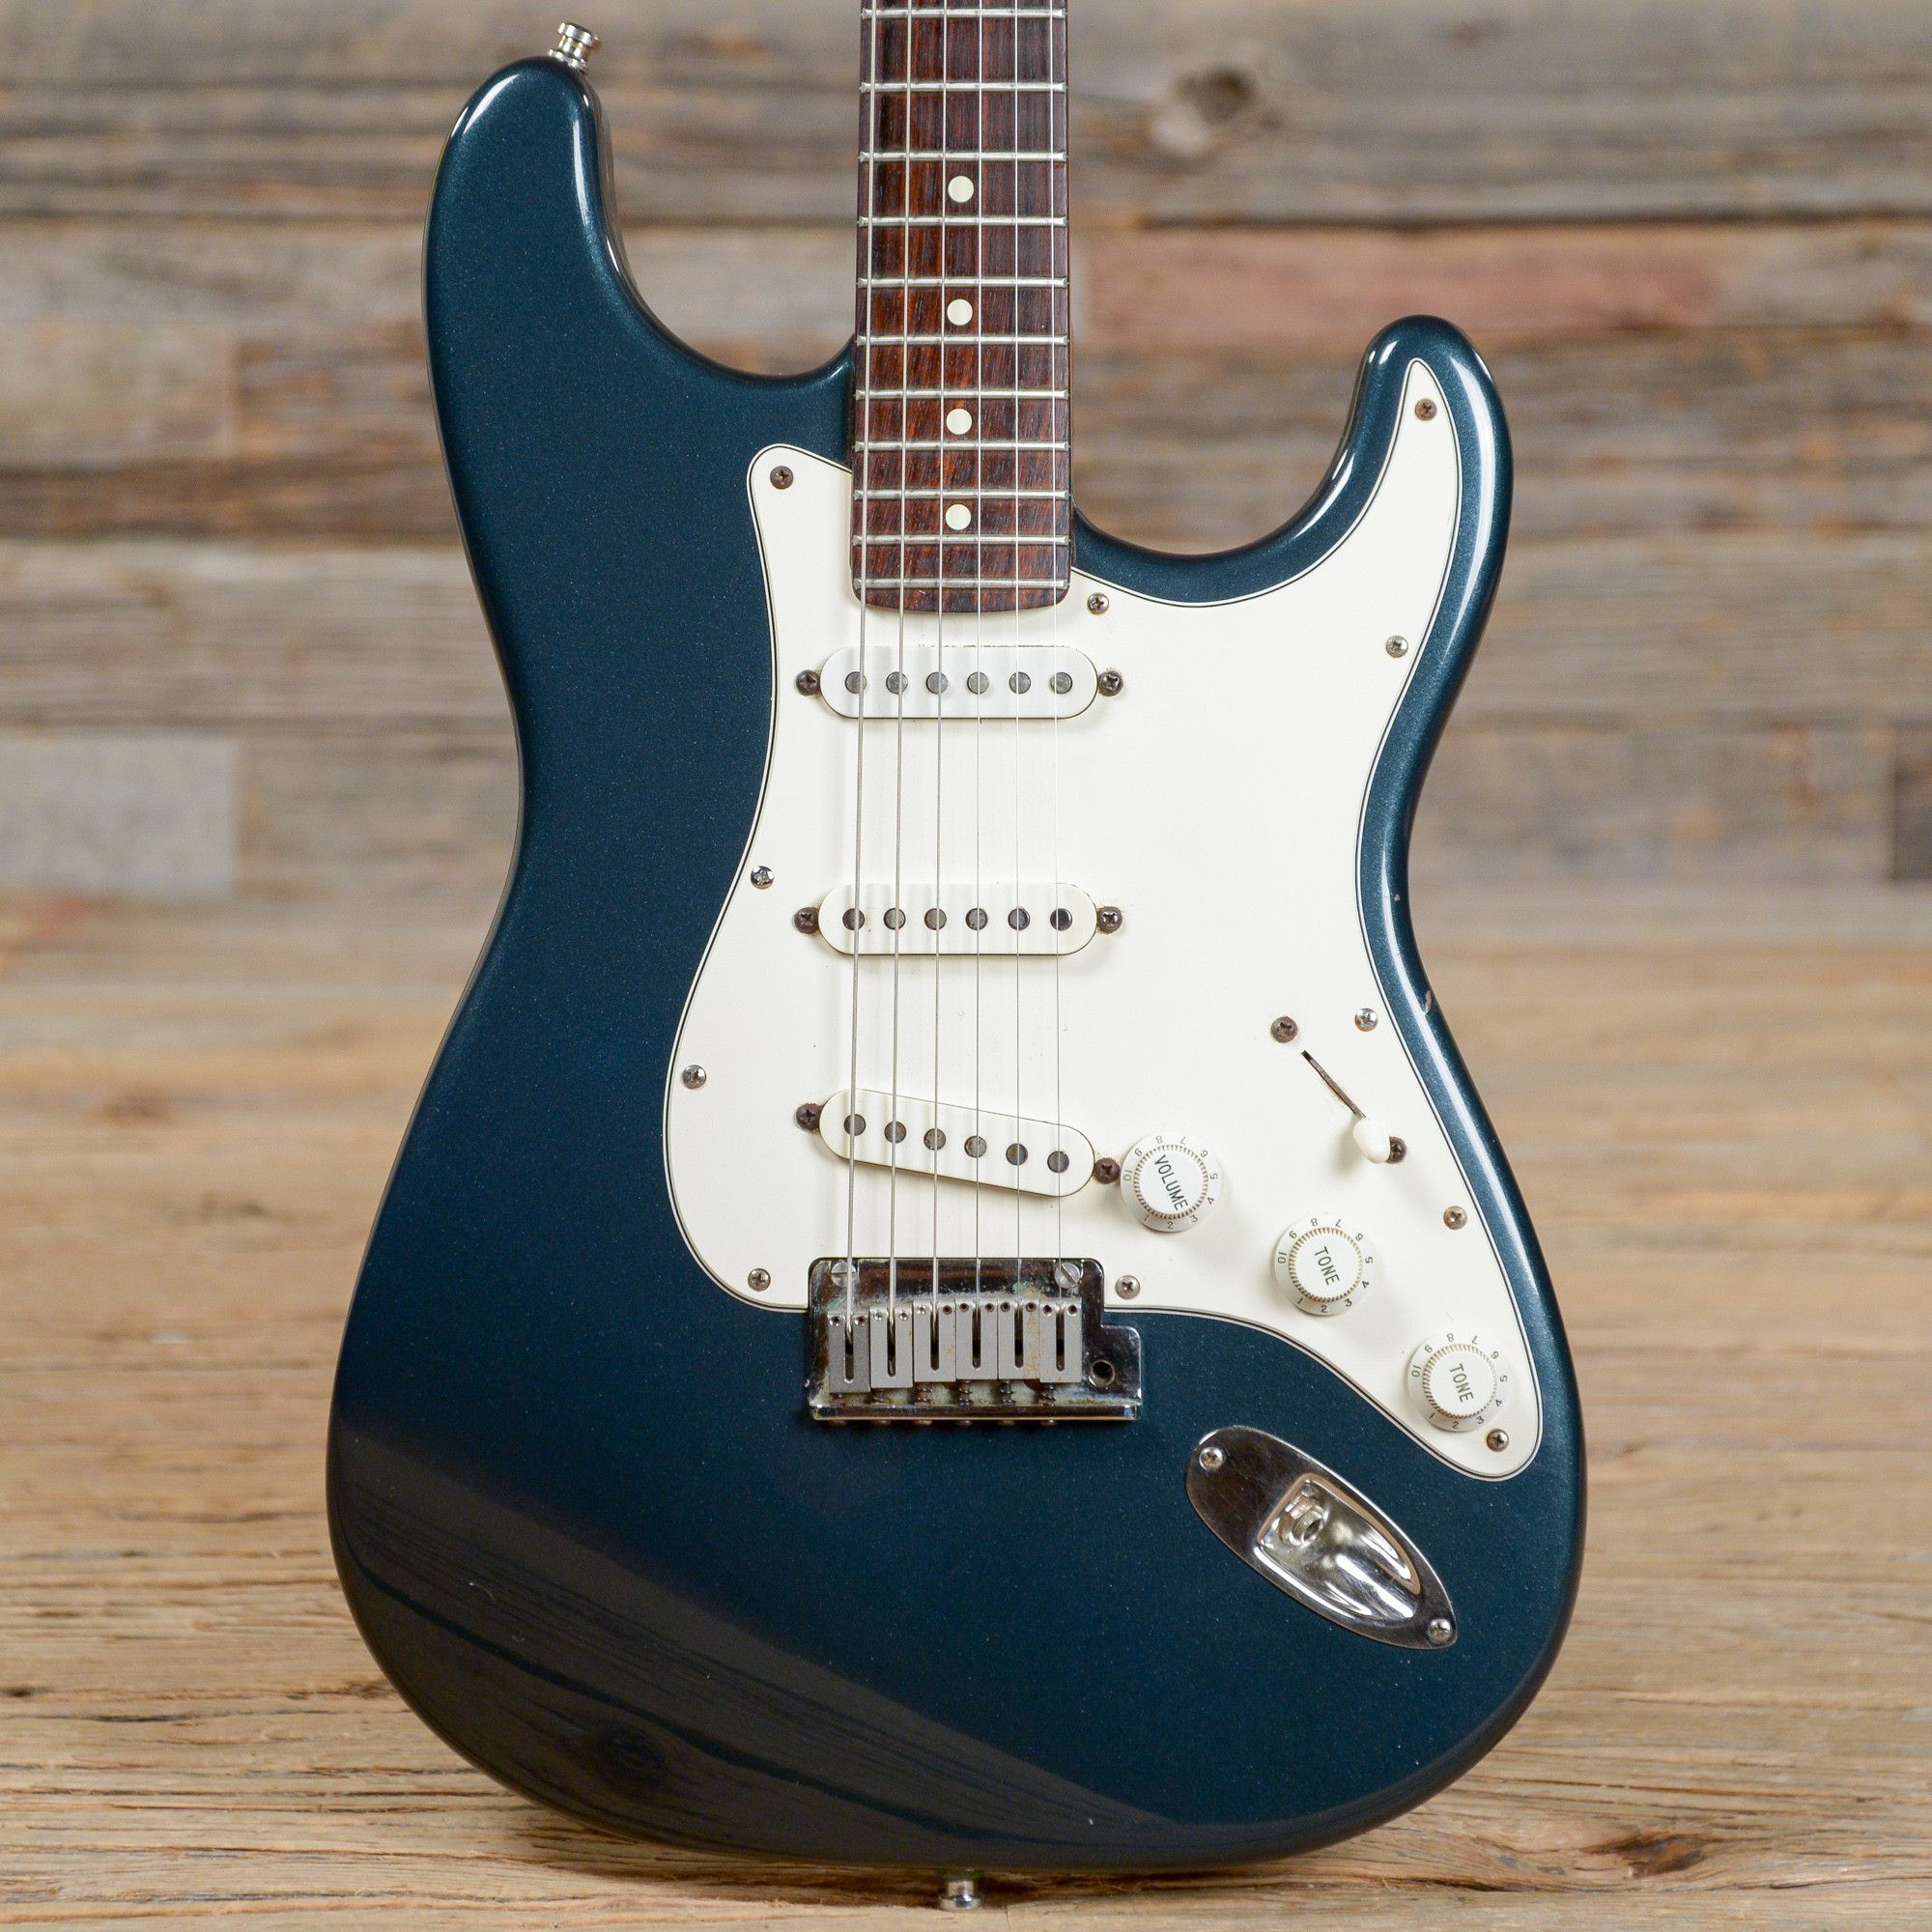 Fender Stratocaster Dark Blue Metallic RW 1989 S146